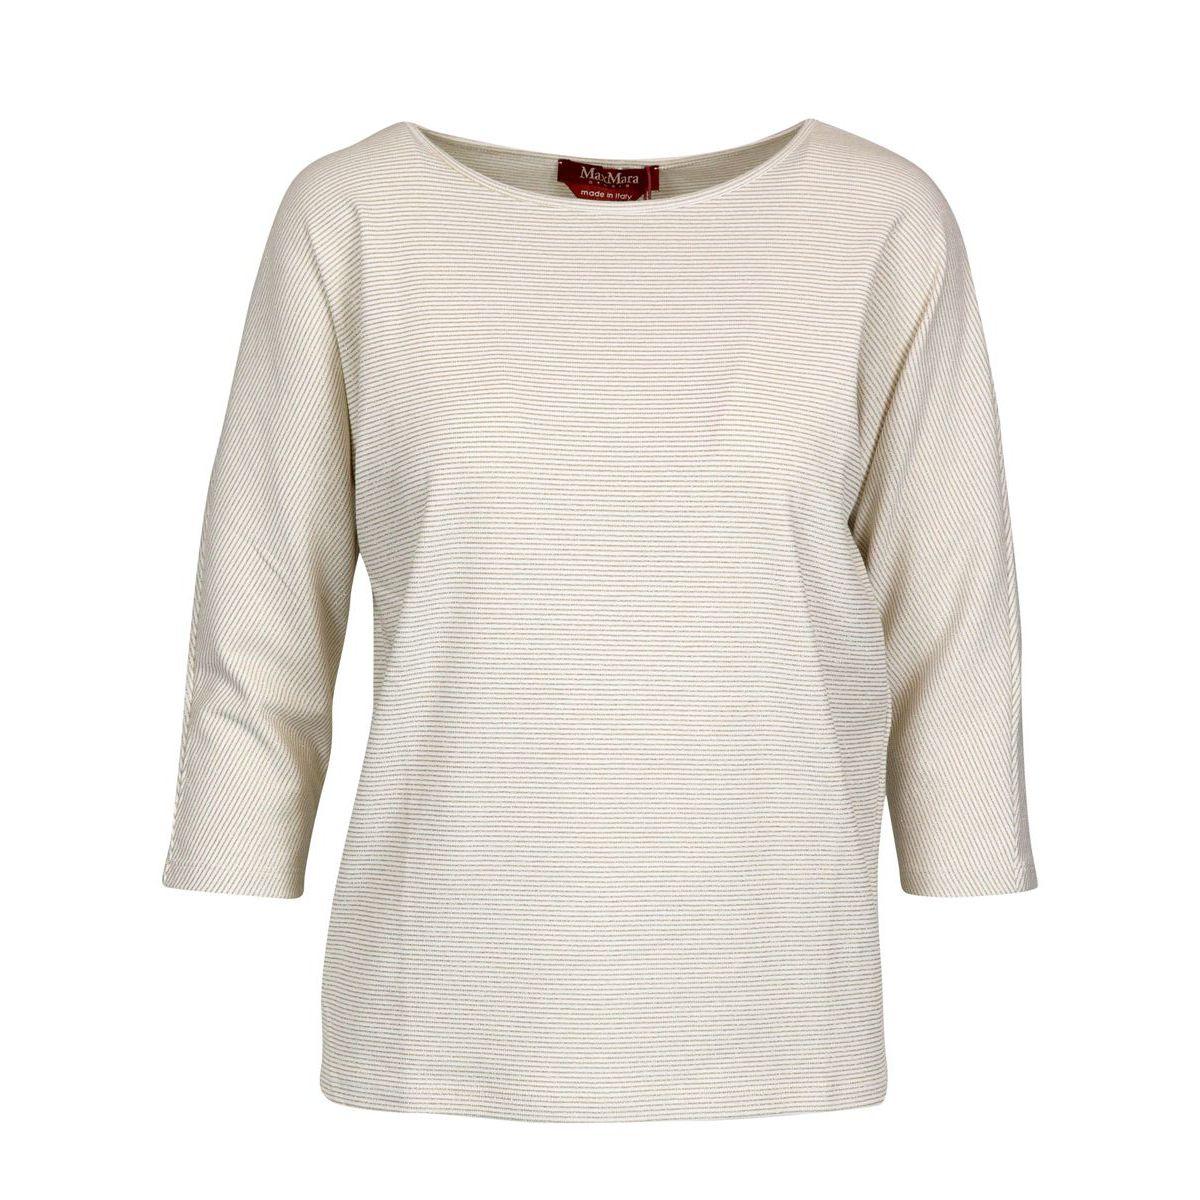 Cotton blend crew neck sweater with lurex stripes Cream / gold Max Mara